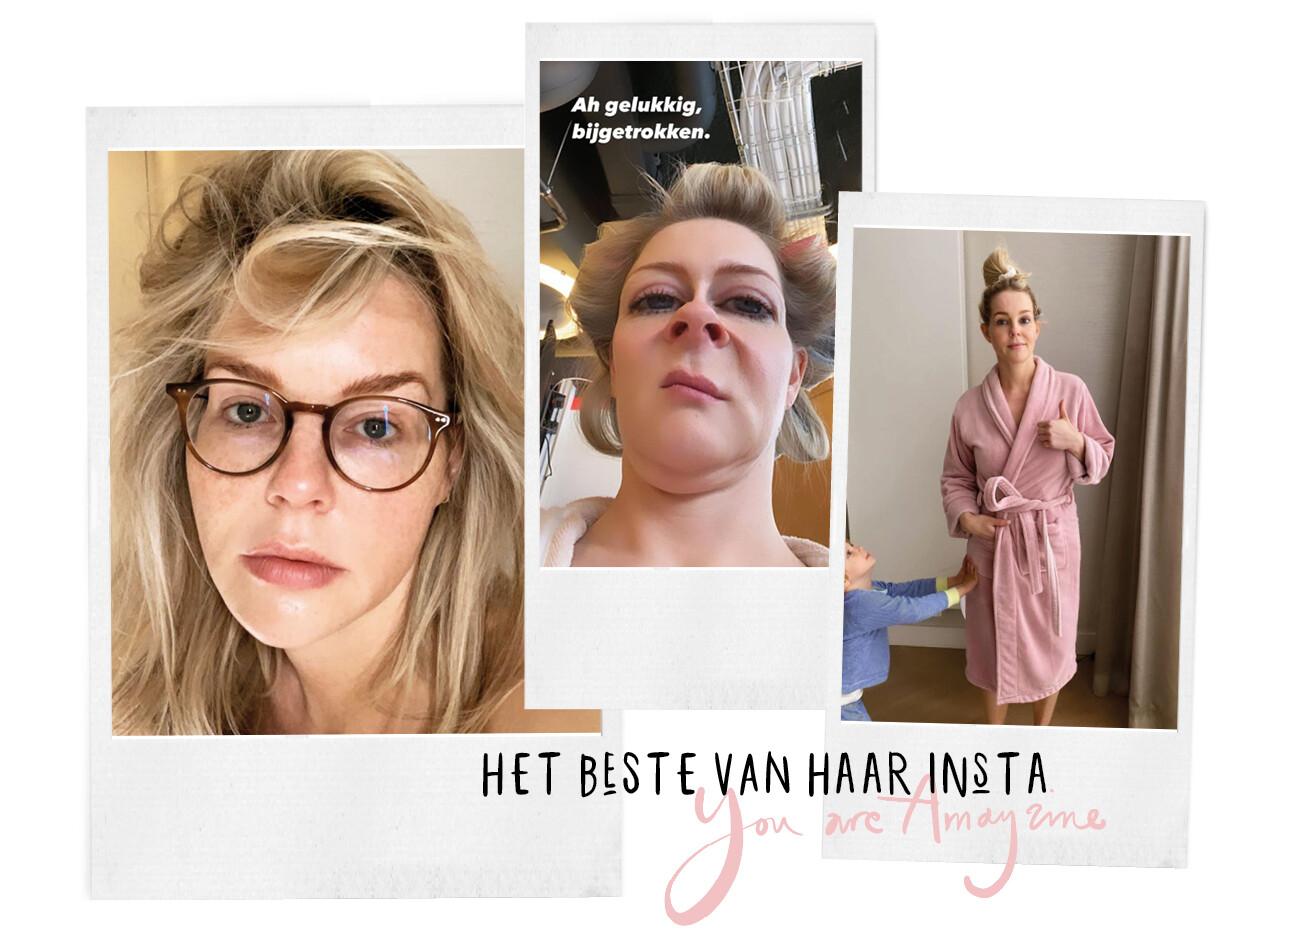 Chantal Janzen grappige momenten van Insta